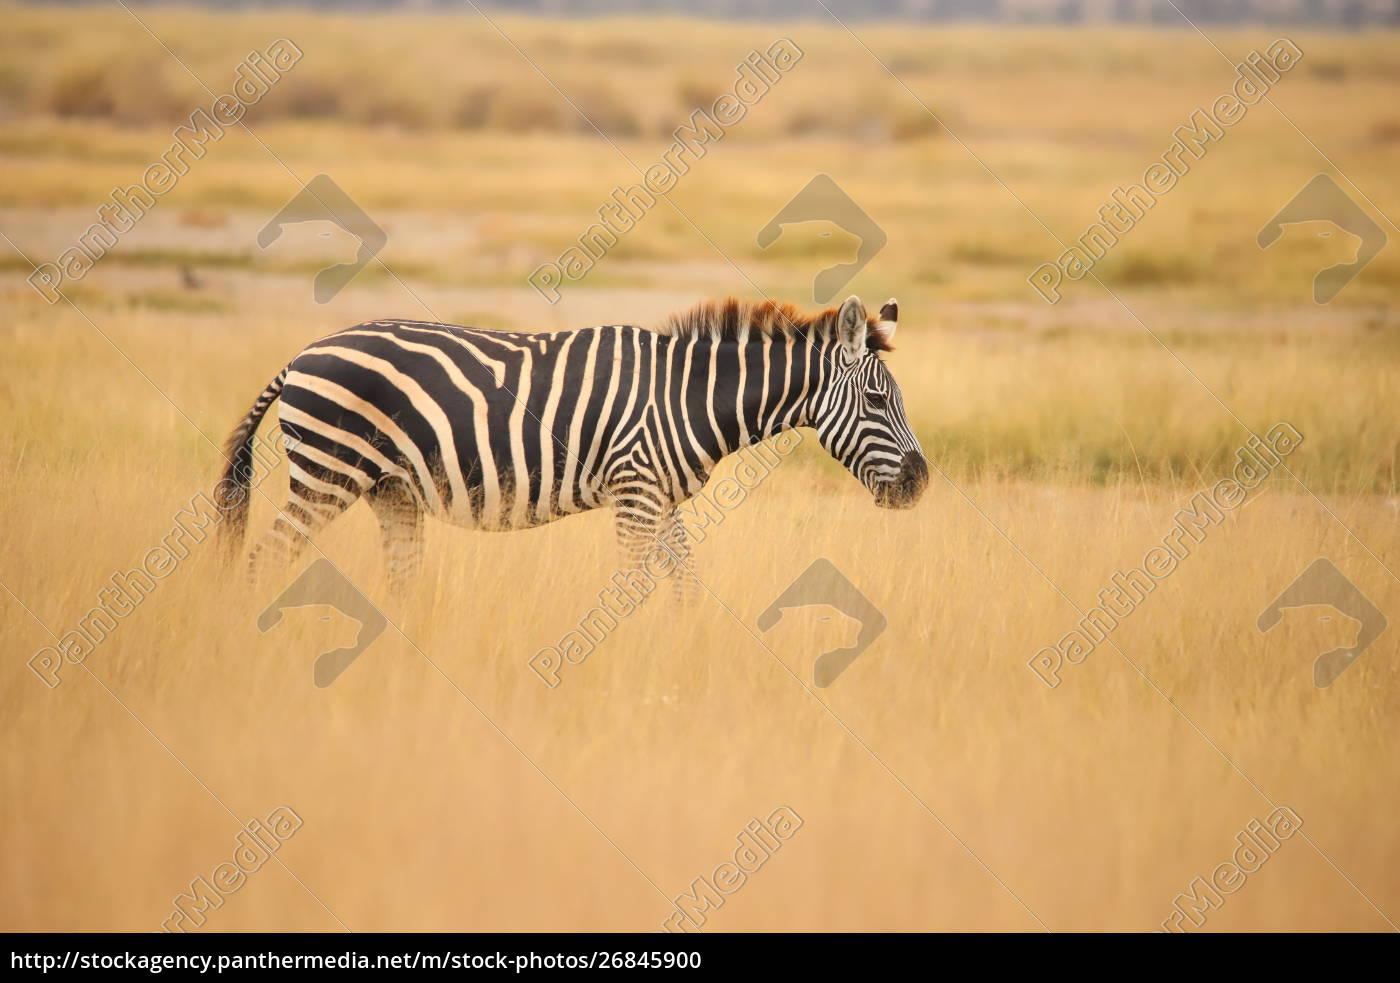 zebra, in, the, grassland, of, amboseli - 26845900